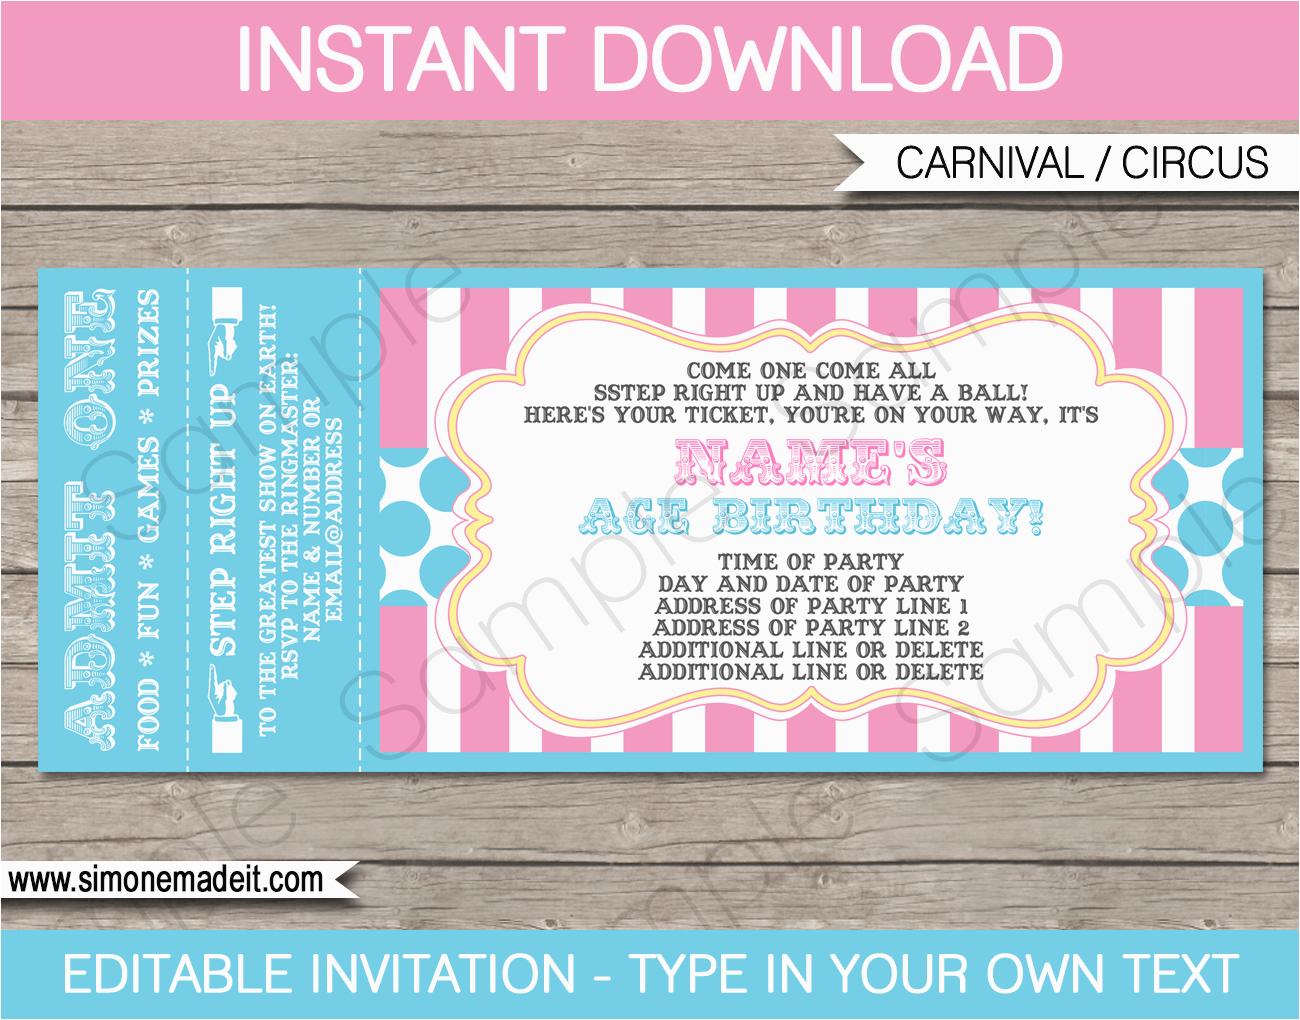 Ticket Birthday Invitation Template Carnival Party Ticket Invitations Template Carnival or